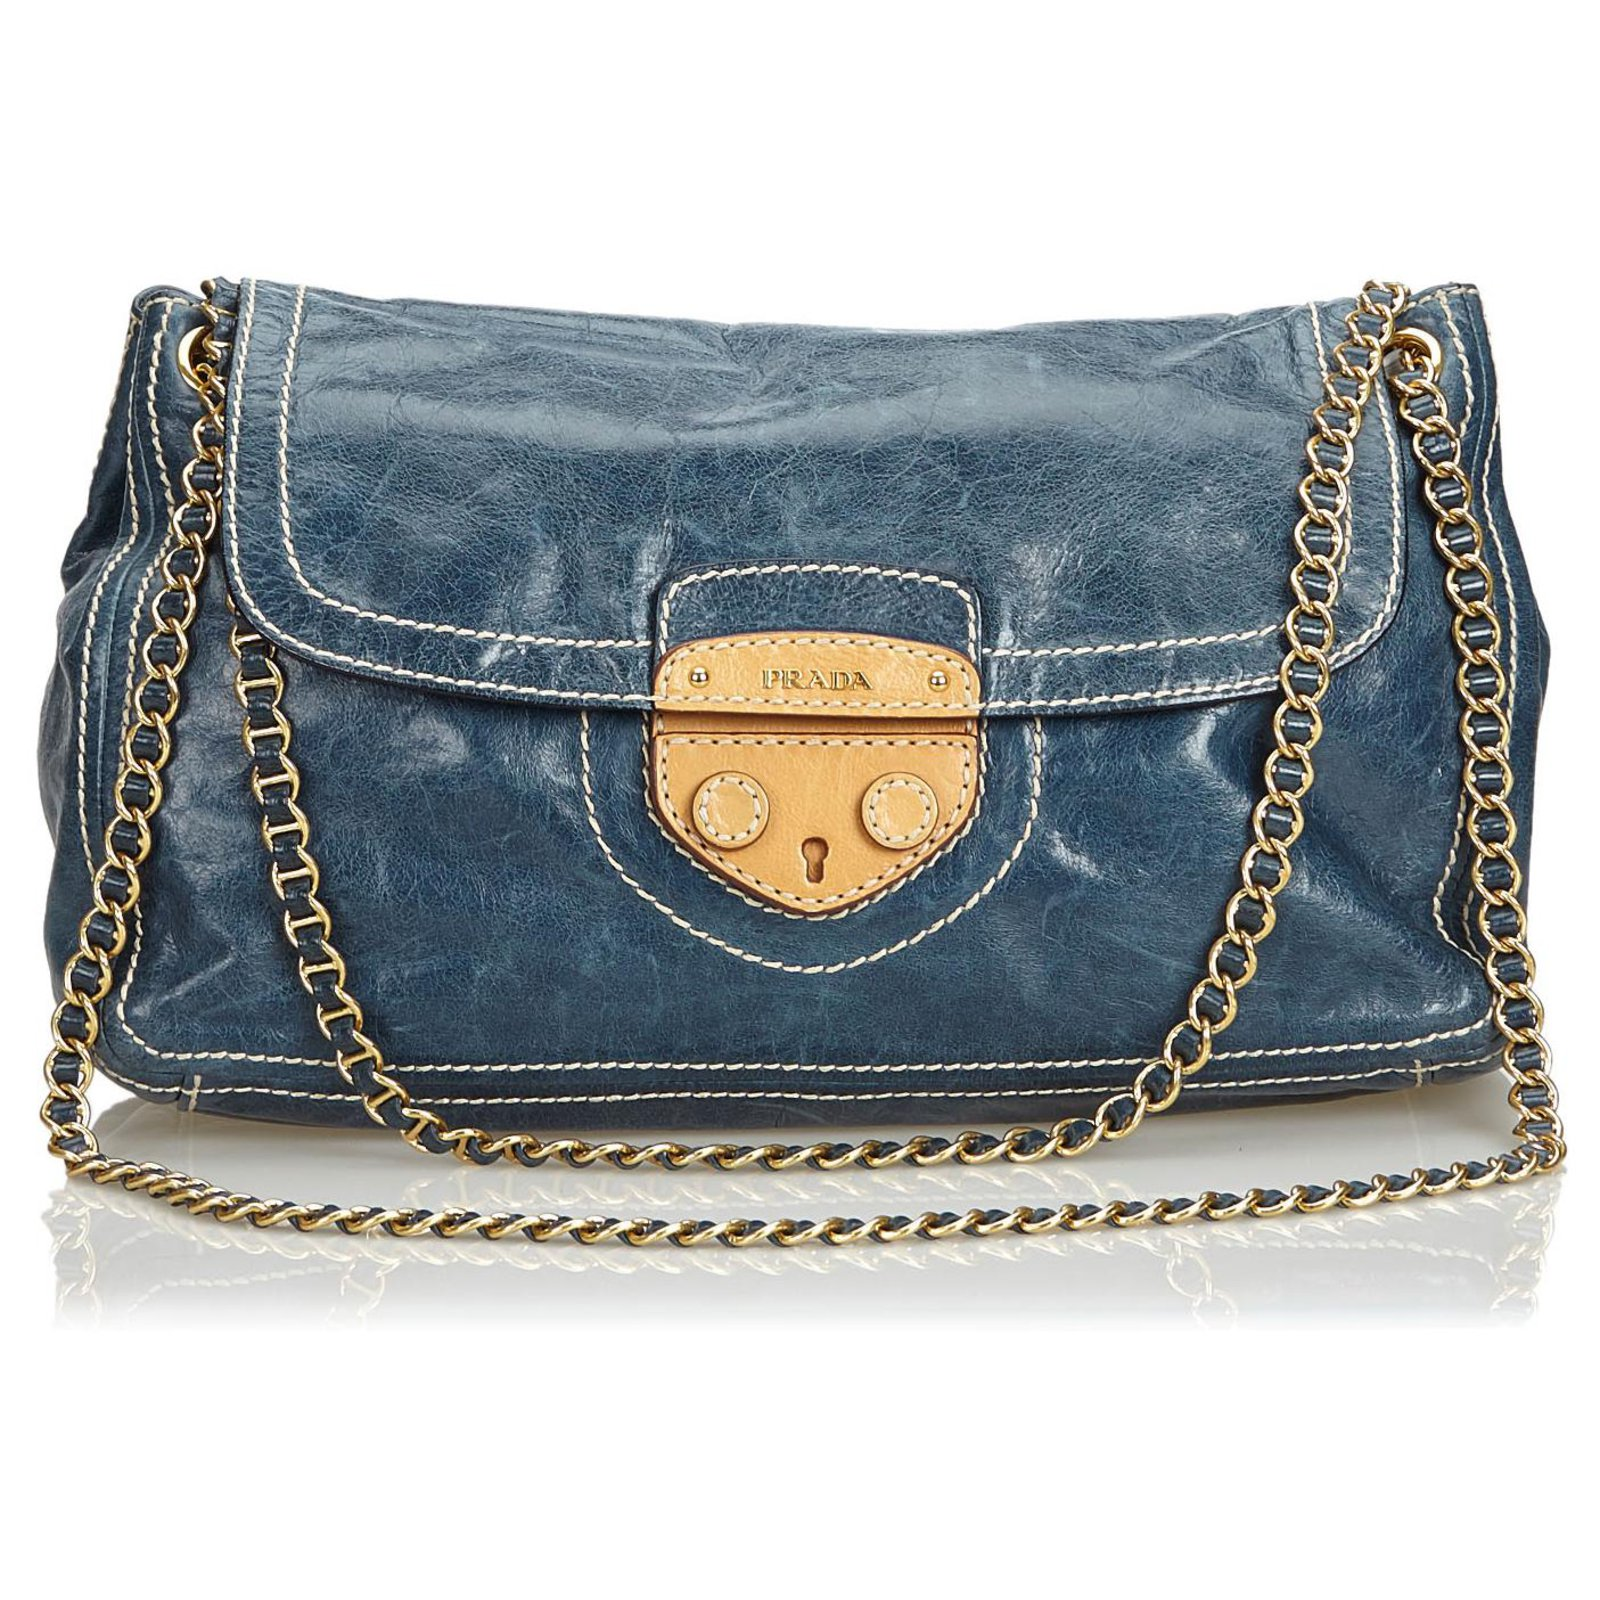 a867abb01b6e47 Prada Prada Blue Leather Chain Shoulder Bag Handbags Leather,Other Brown, Blue,Light